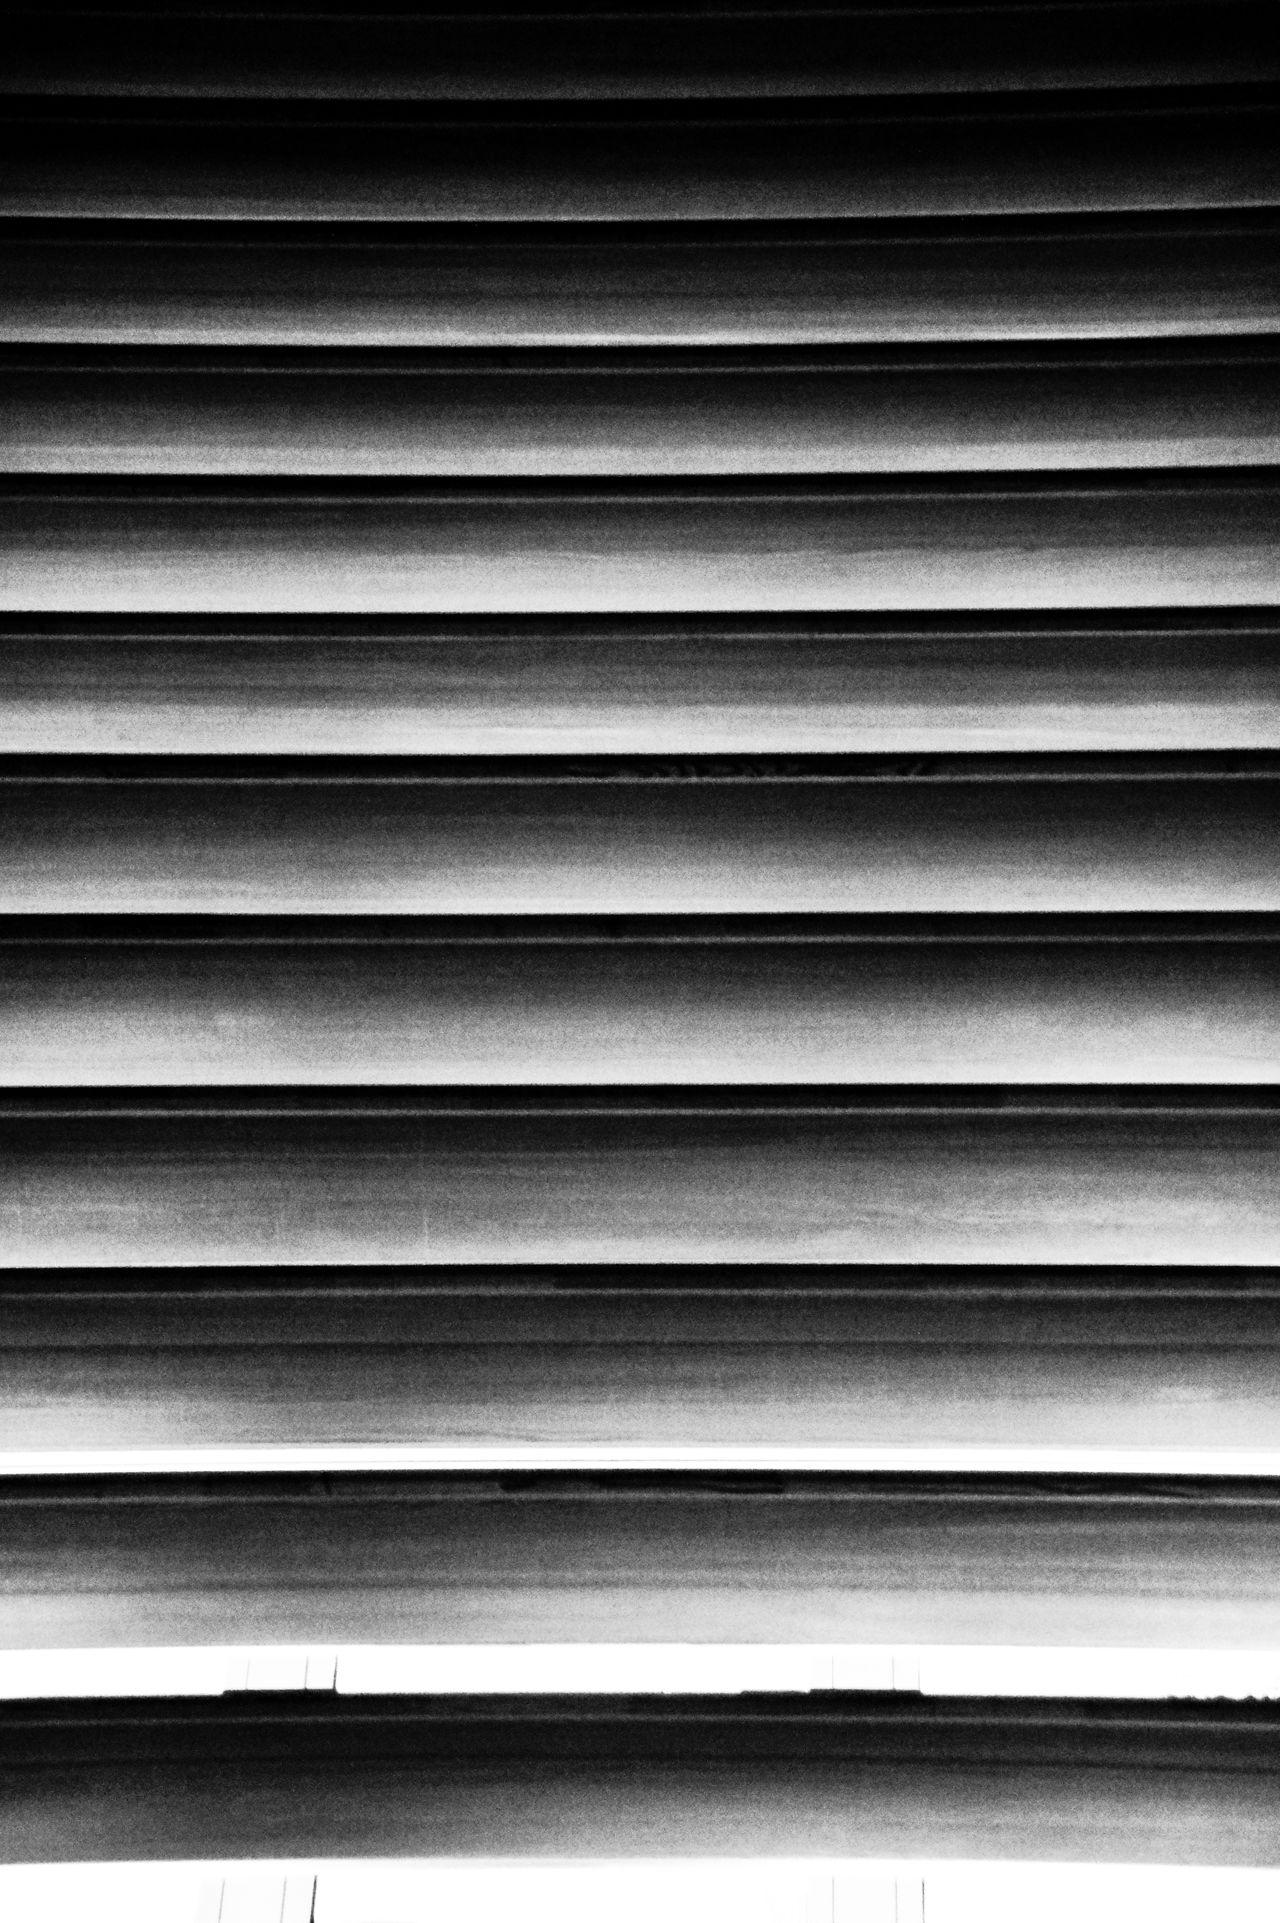 Backgrounds Blinds BYOPaper! Close-up Corrugated Iron Day Full Frame Indoors  No People Pattern Textured  The Architect - 2017 EyeEm Awards The Street Photographer - 2017 EyeEm Awards